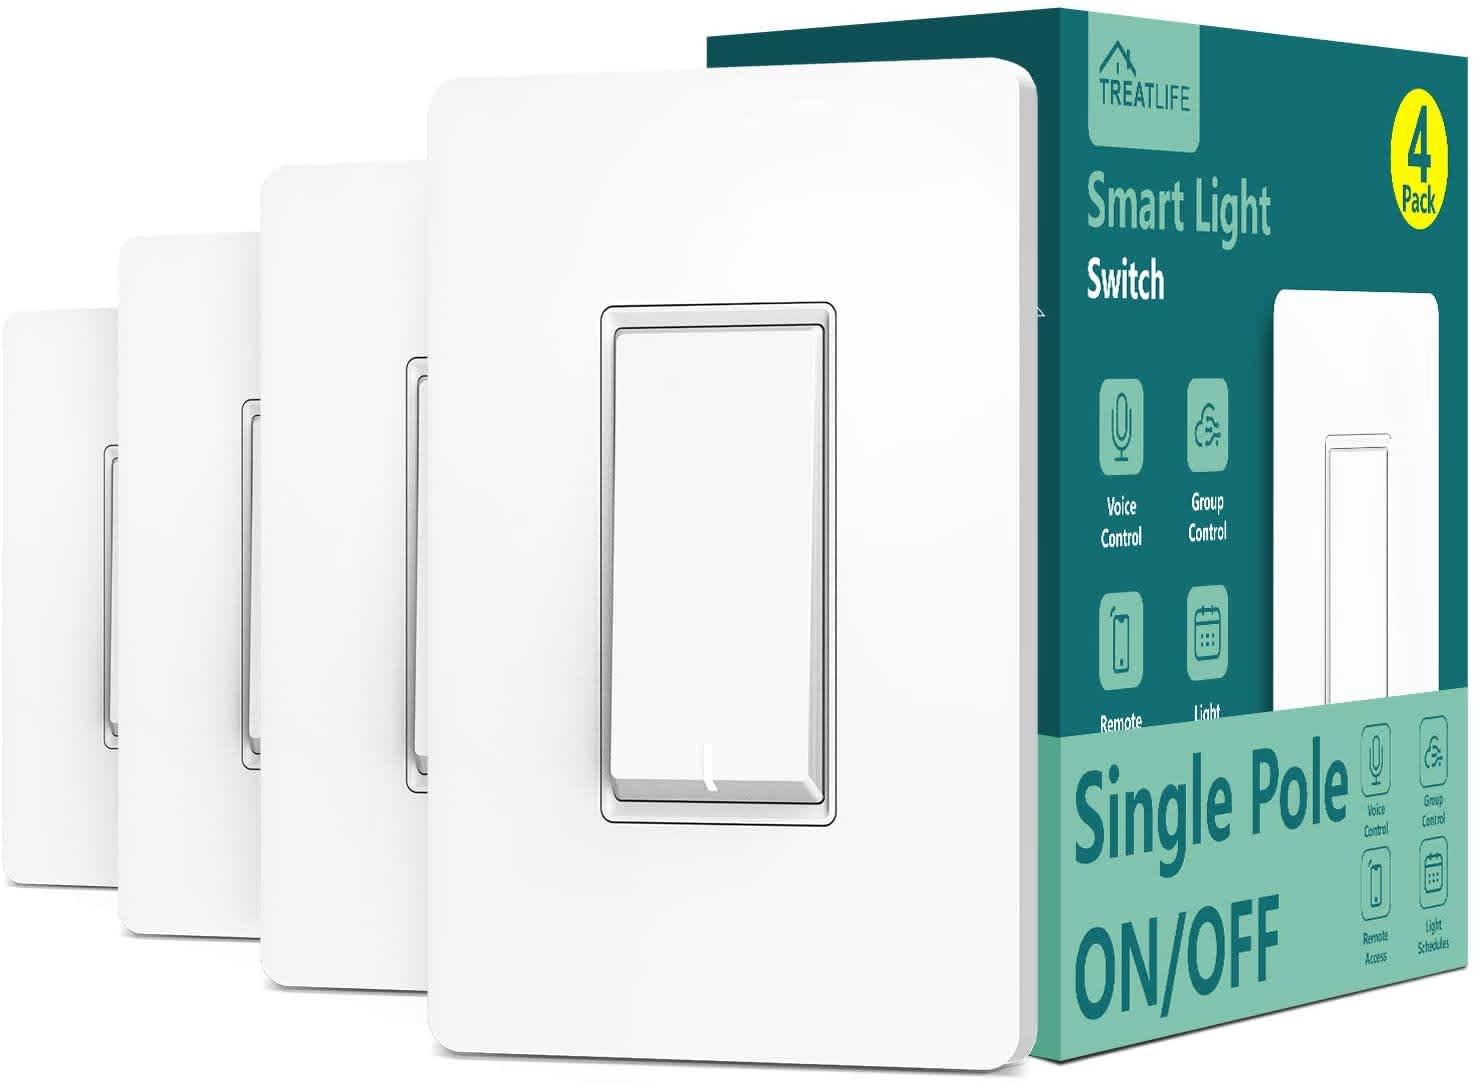 Treatlife Smart Light Switch 4-Pack